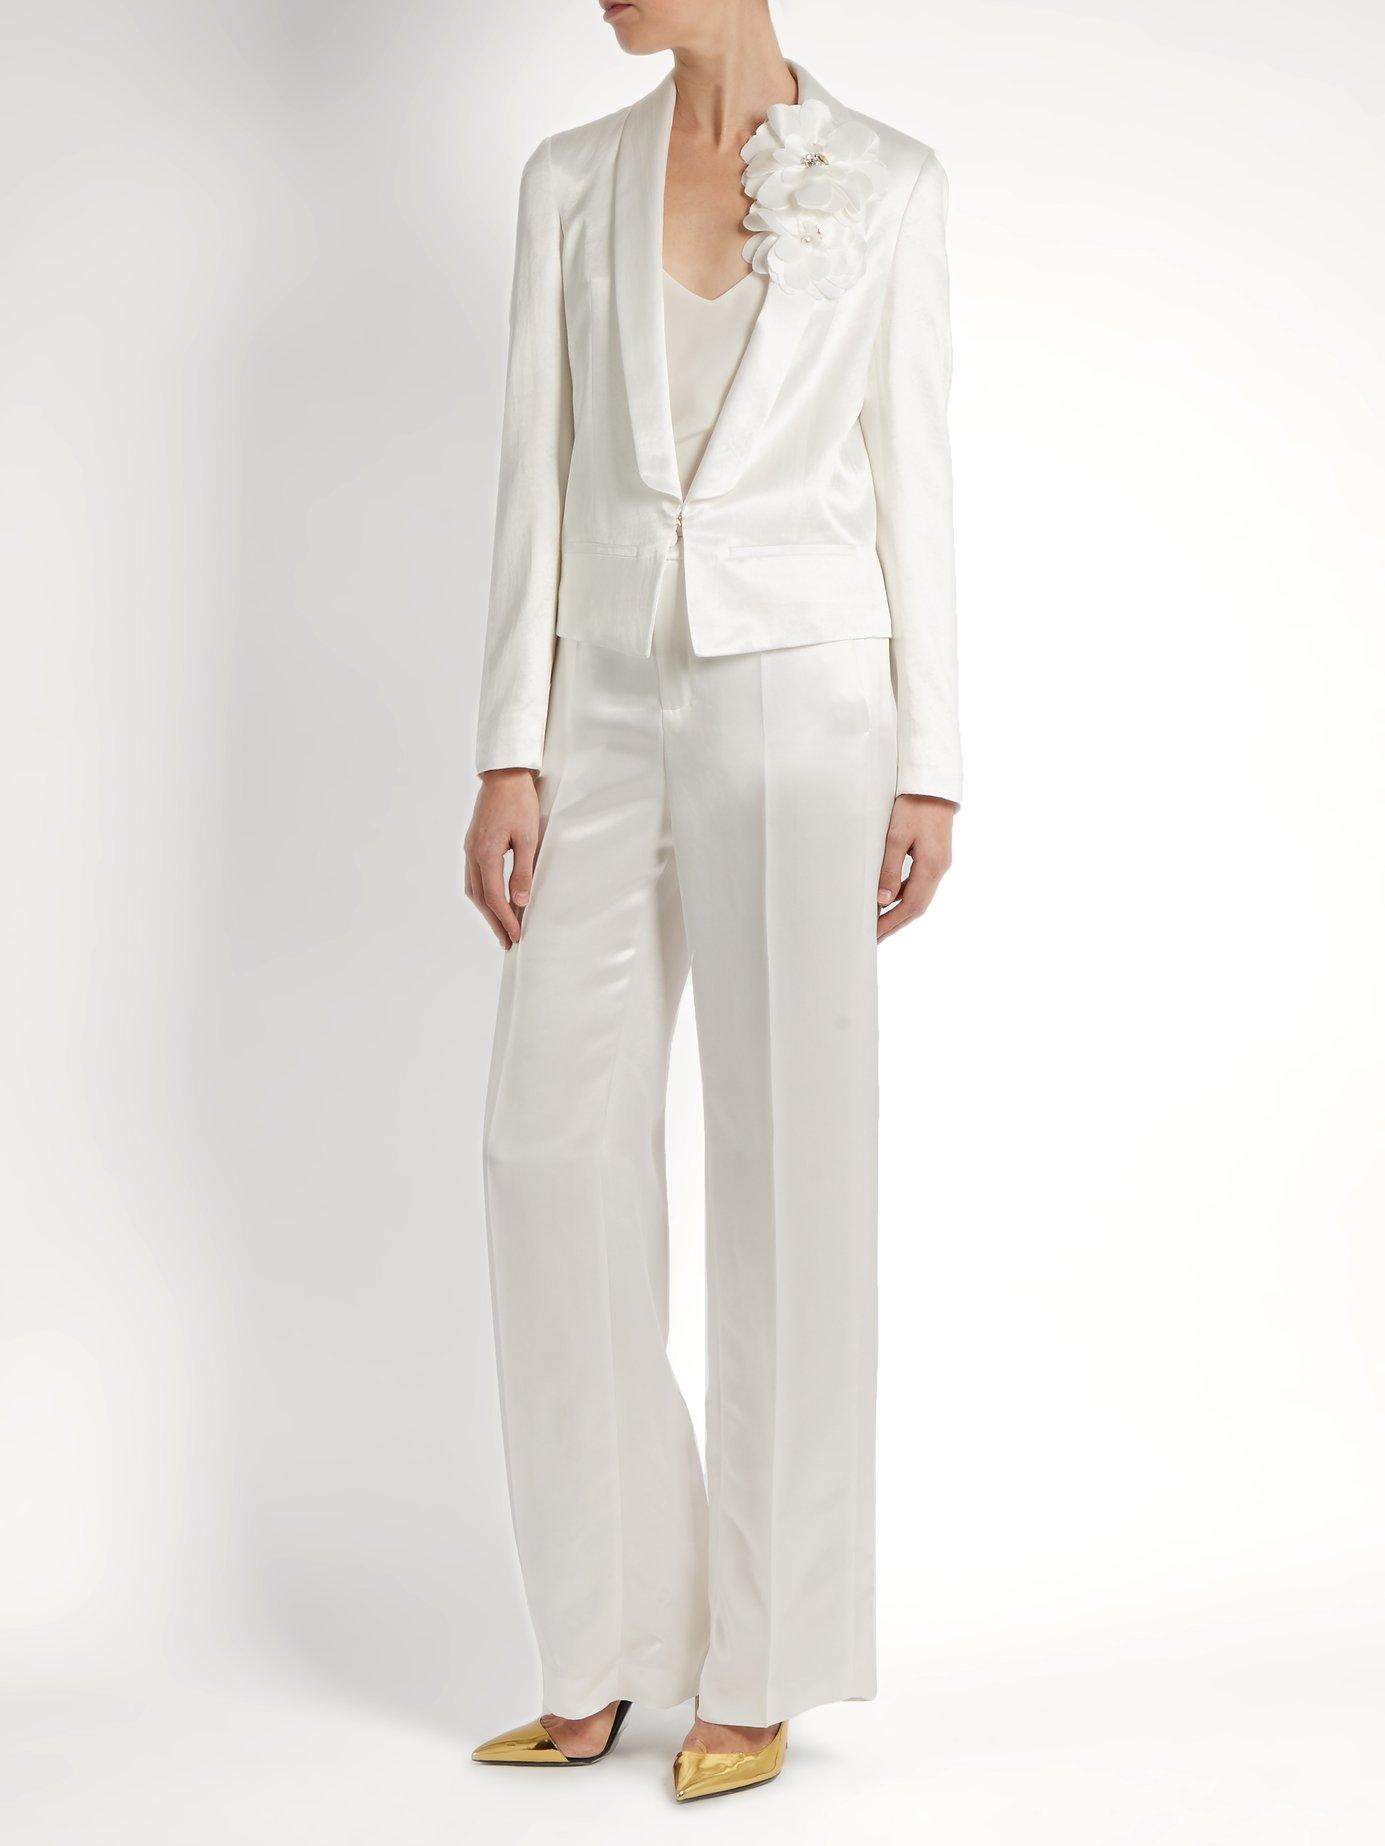 Shawl-lapel tuxedo jacket by Lanvin